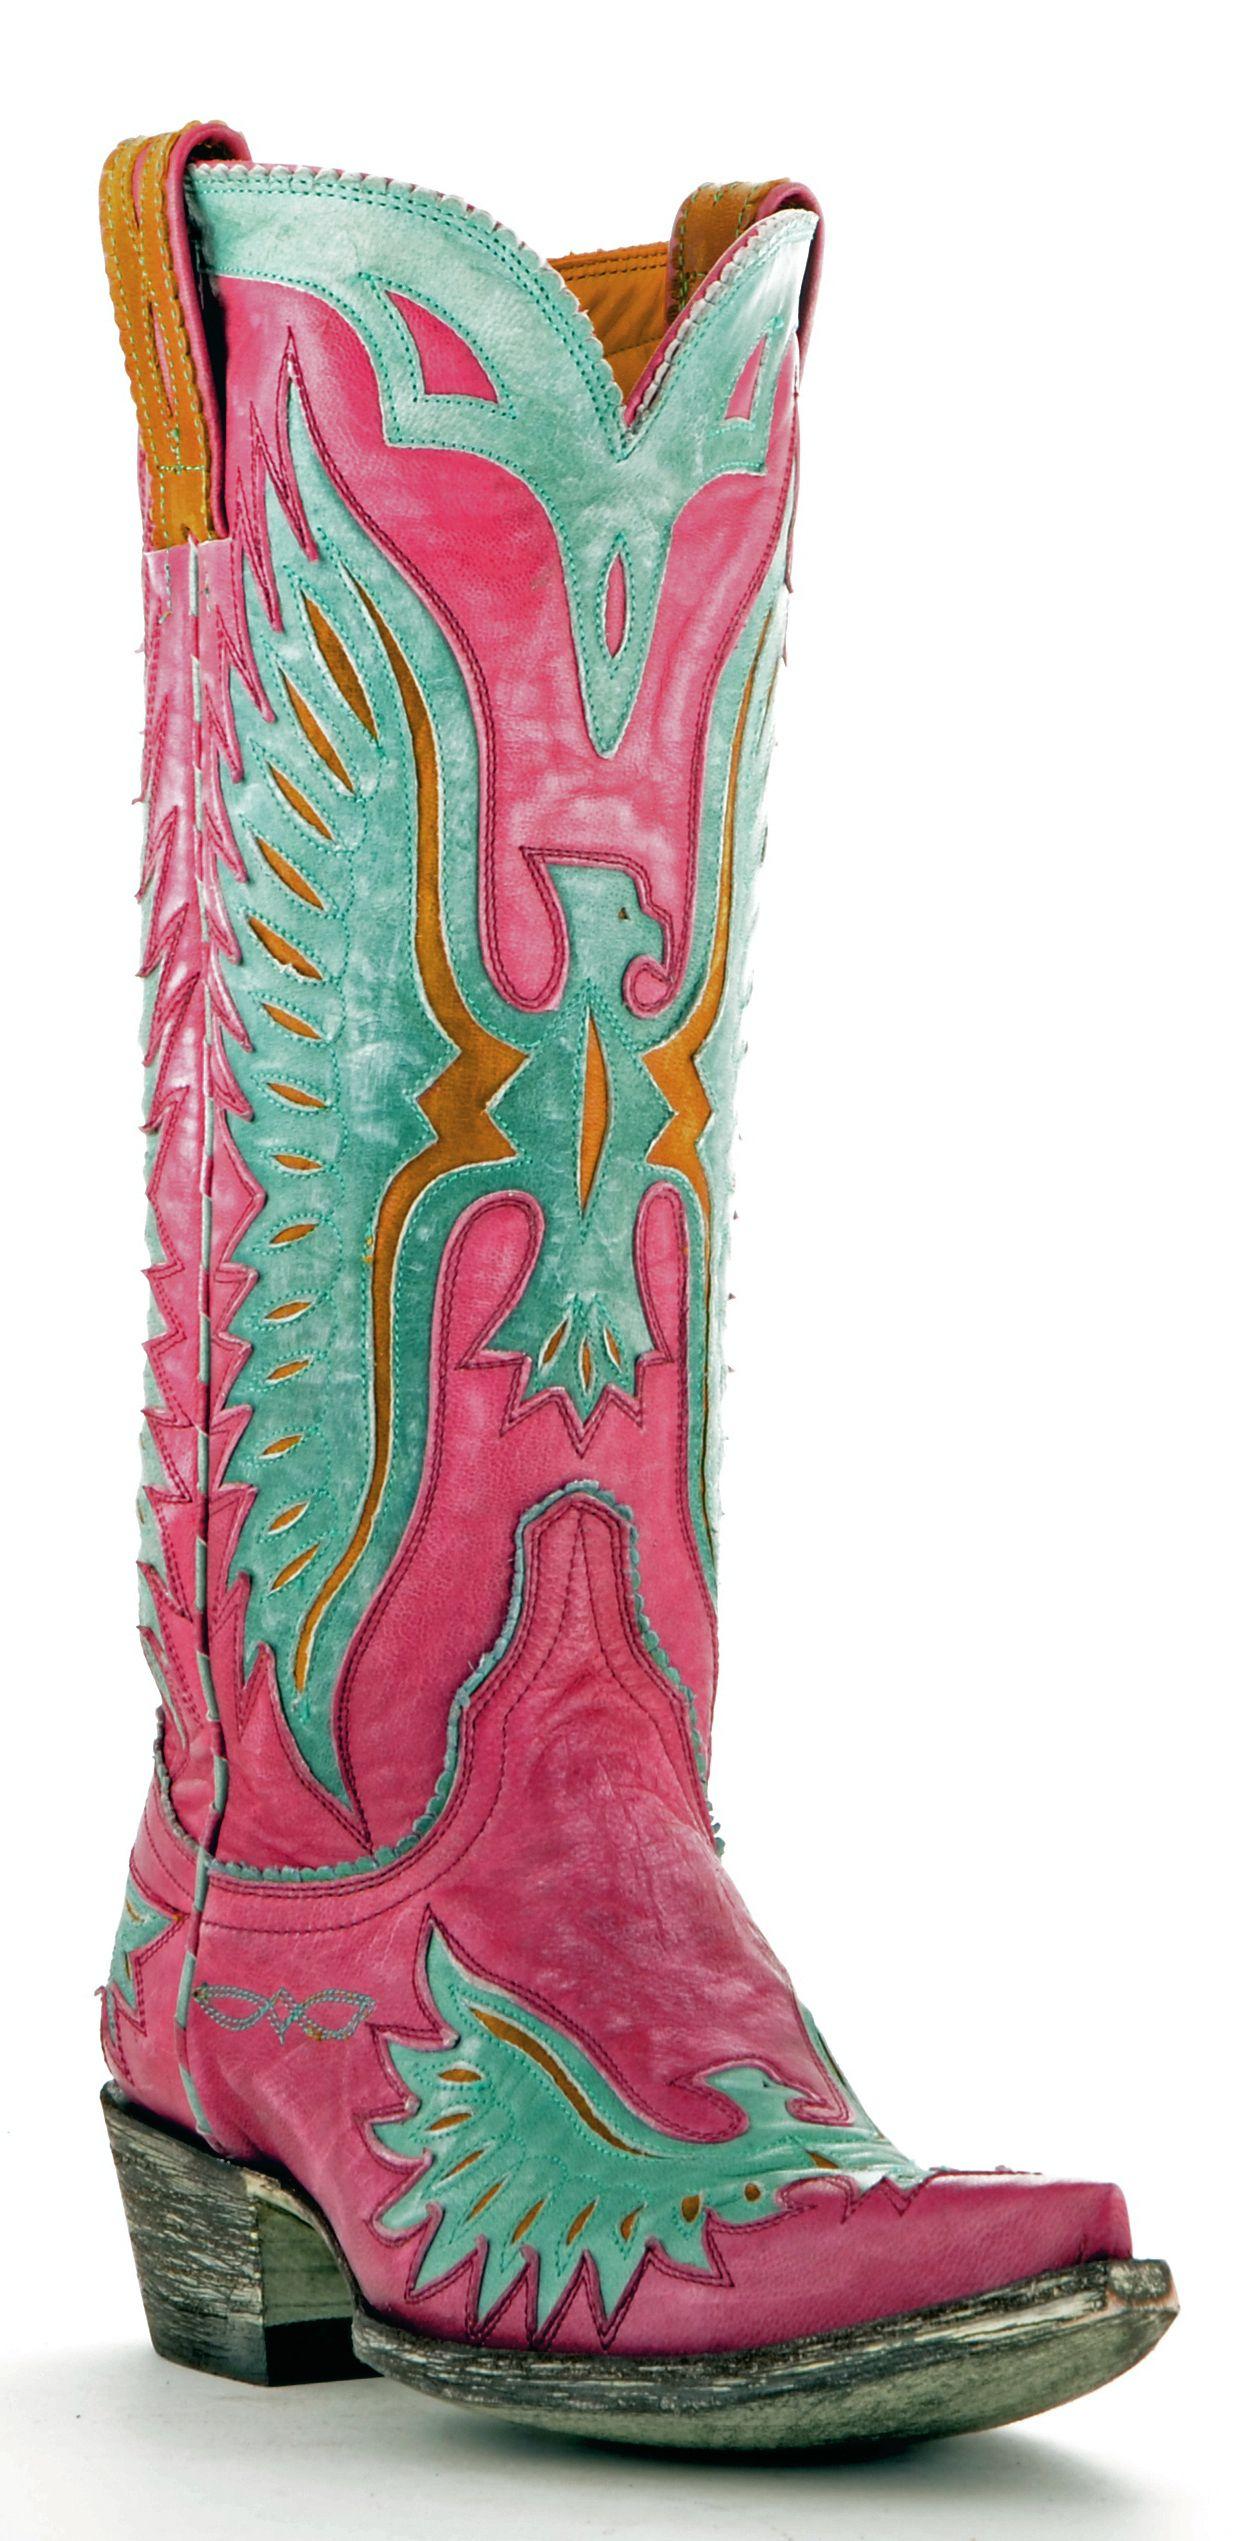 Old Gringo Eagle Boots